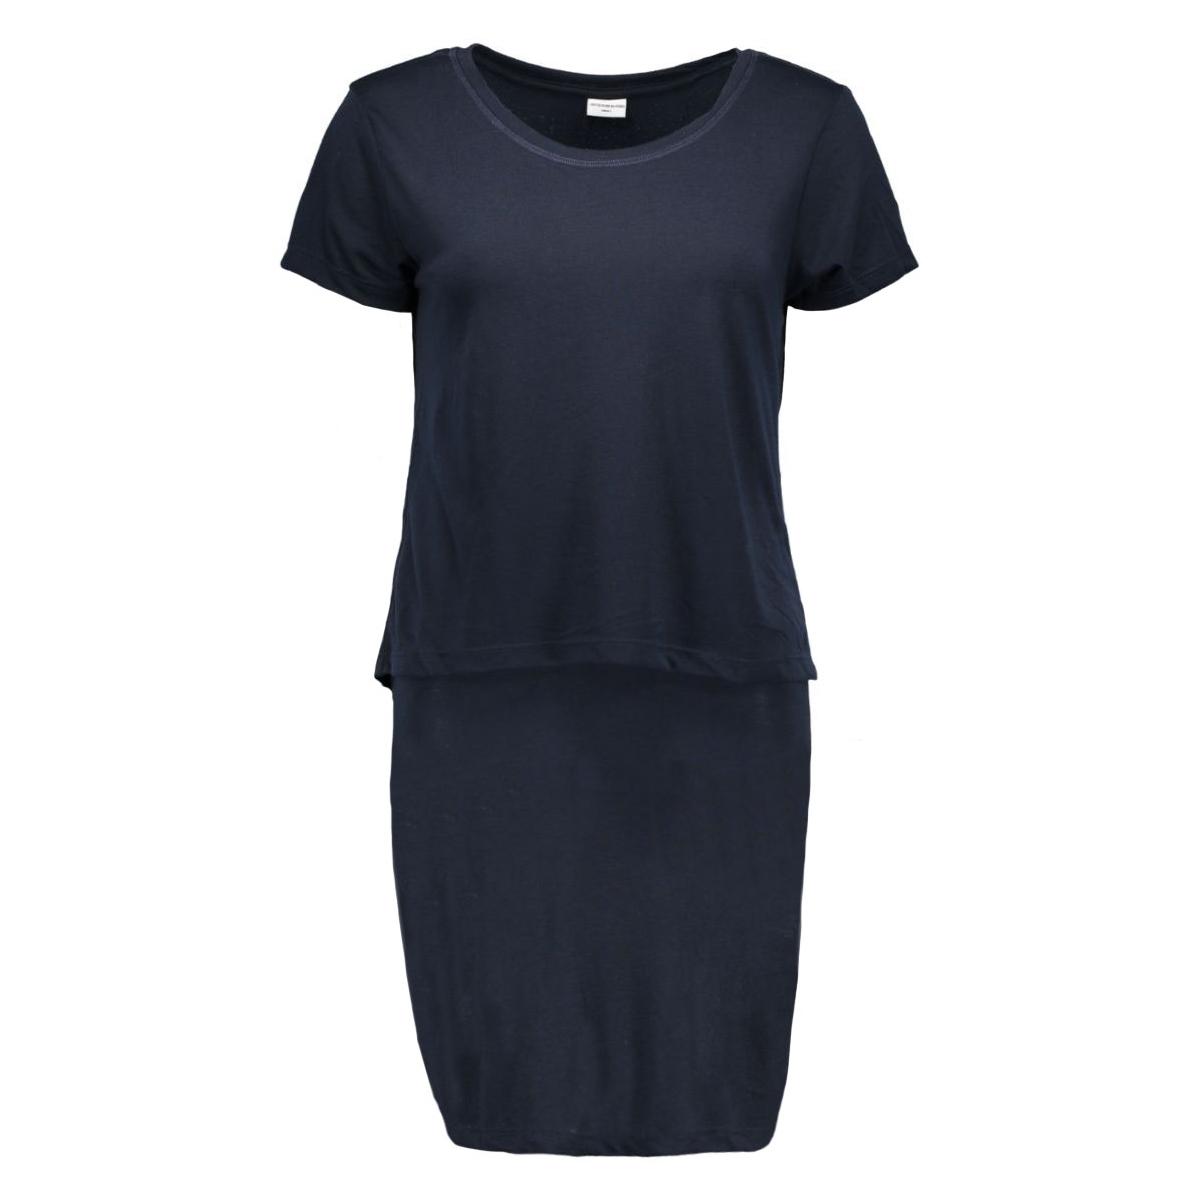 jdykira s/s dress jrs 15117245 jacqueline de yong jurk sky captain